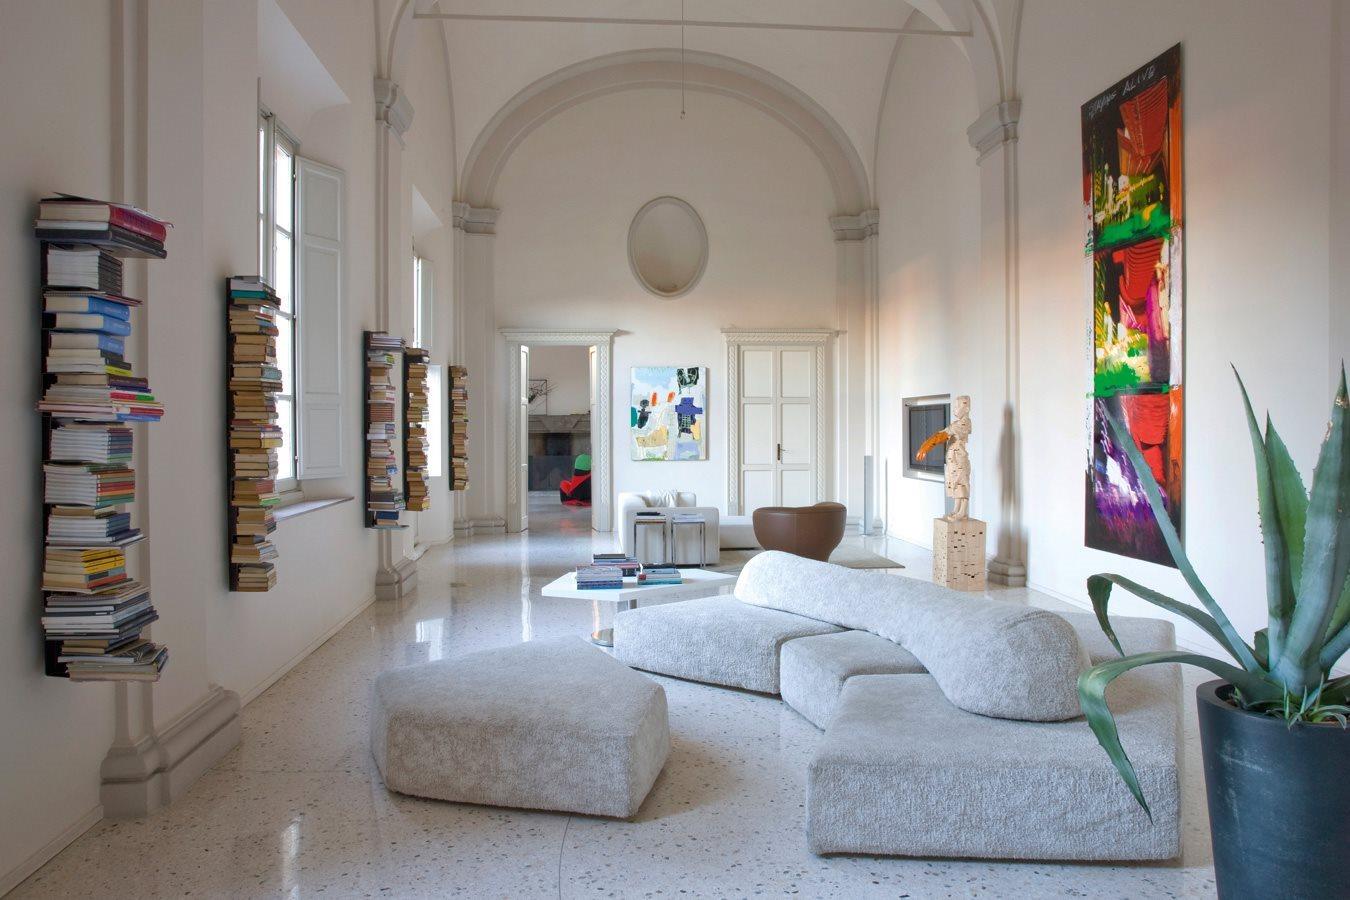 francesco binfar arredo e convivio. Black Bedroom Furniture Sets. Home Design Ideas